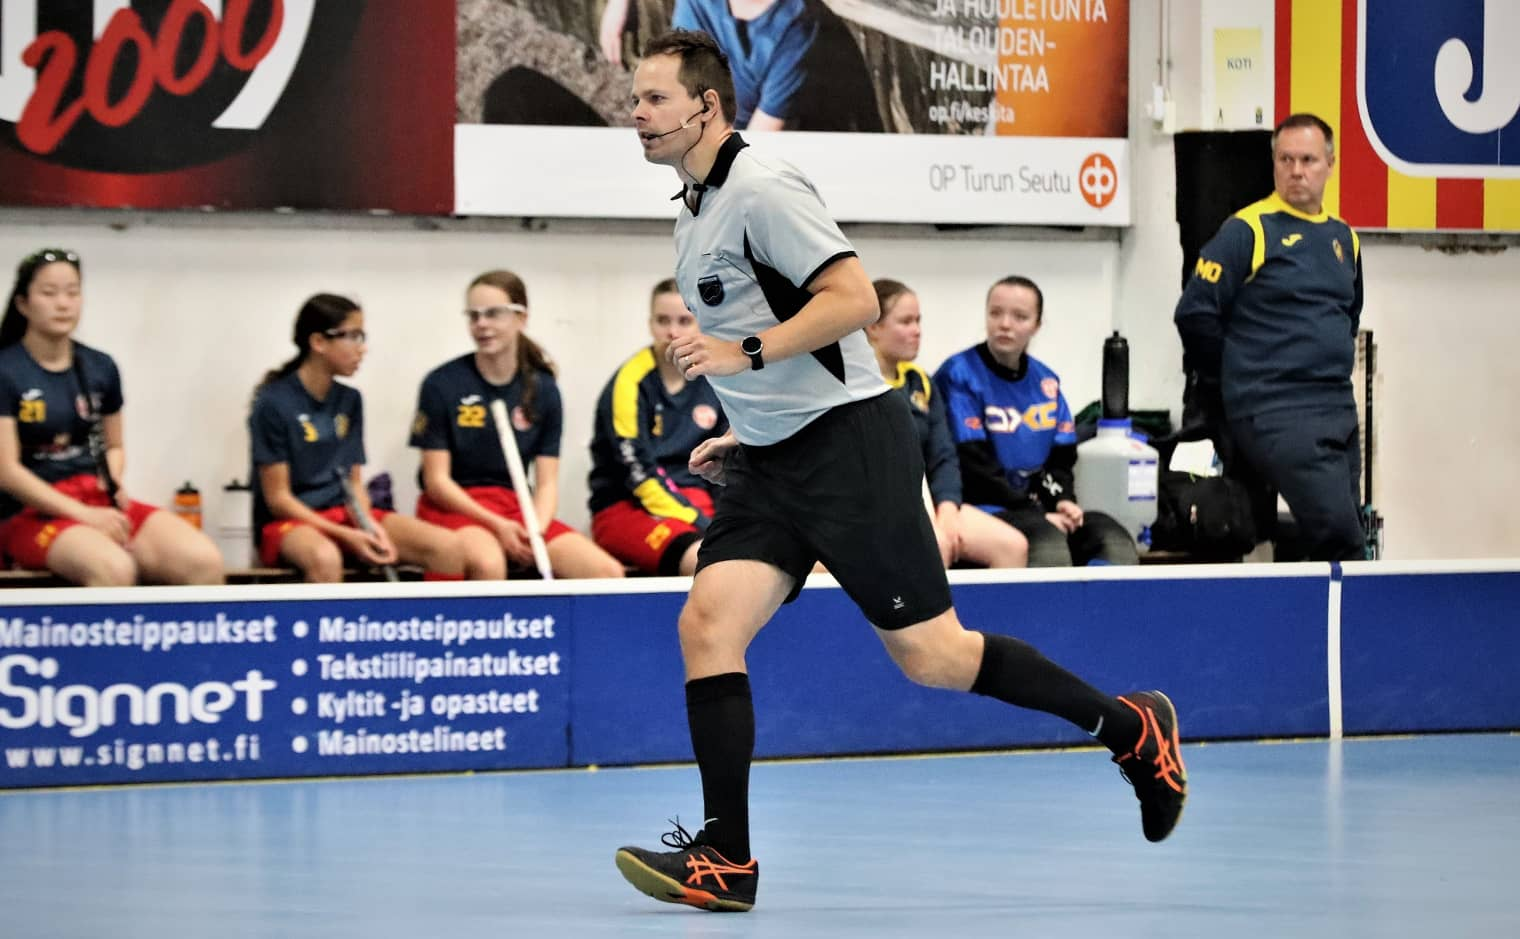 Janne Virta